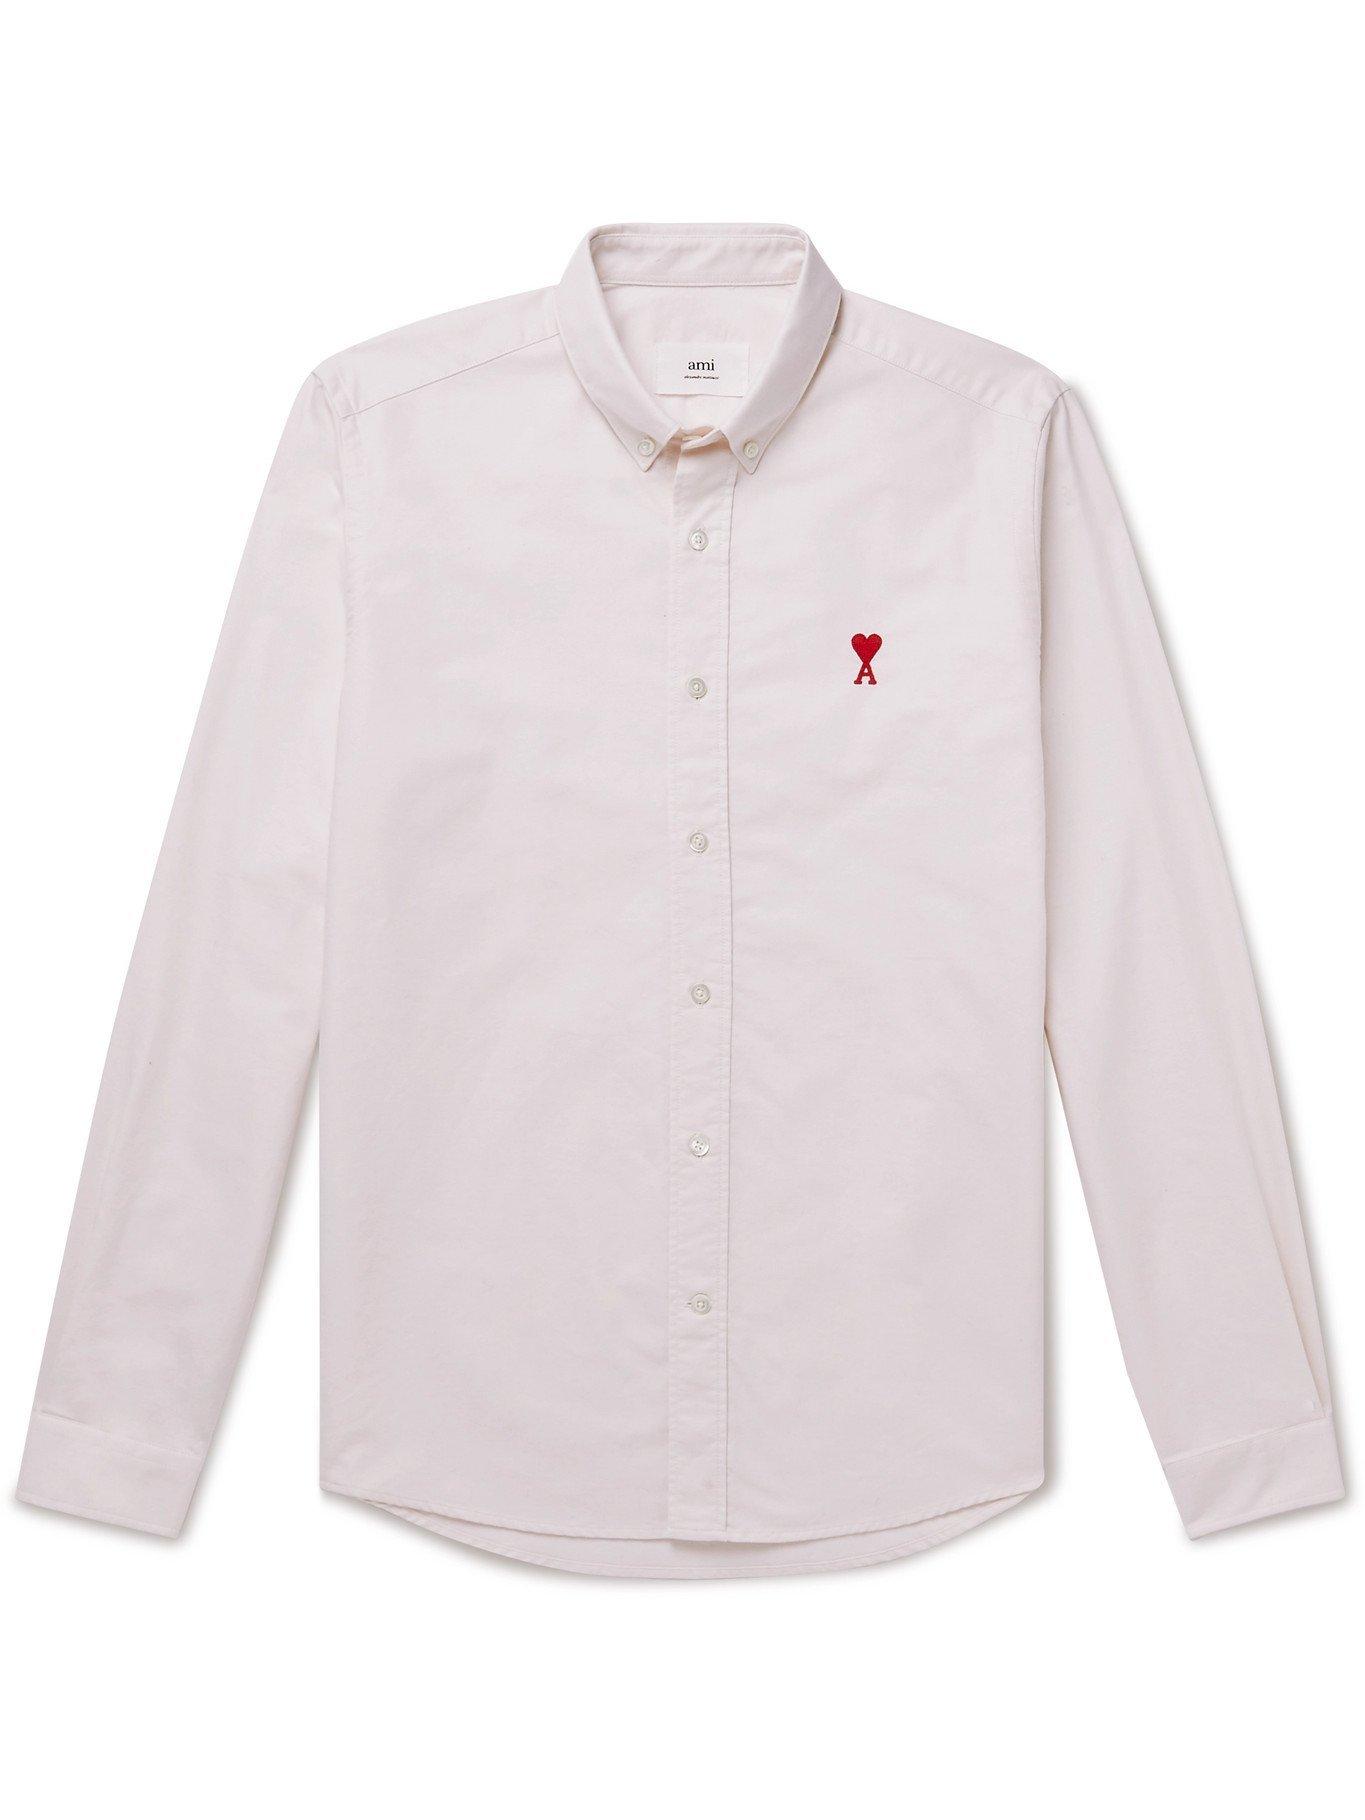 AMI PARIS - Slim-Fit Logo-Embroidered Cotton Oxford Shirt - Neutrals